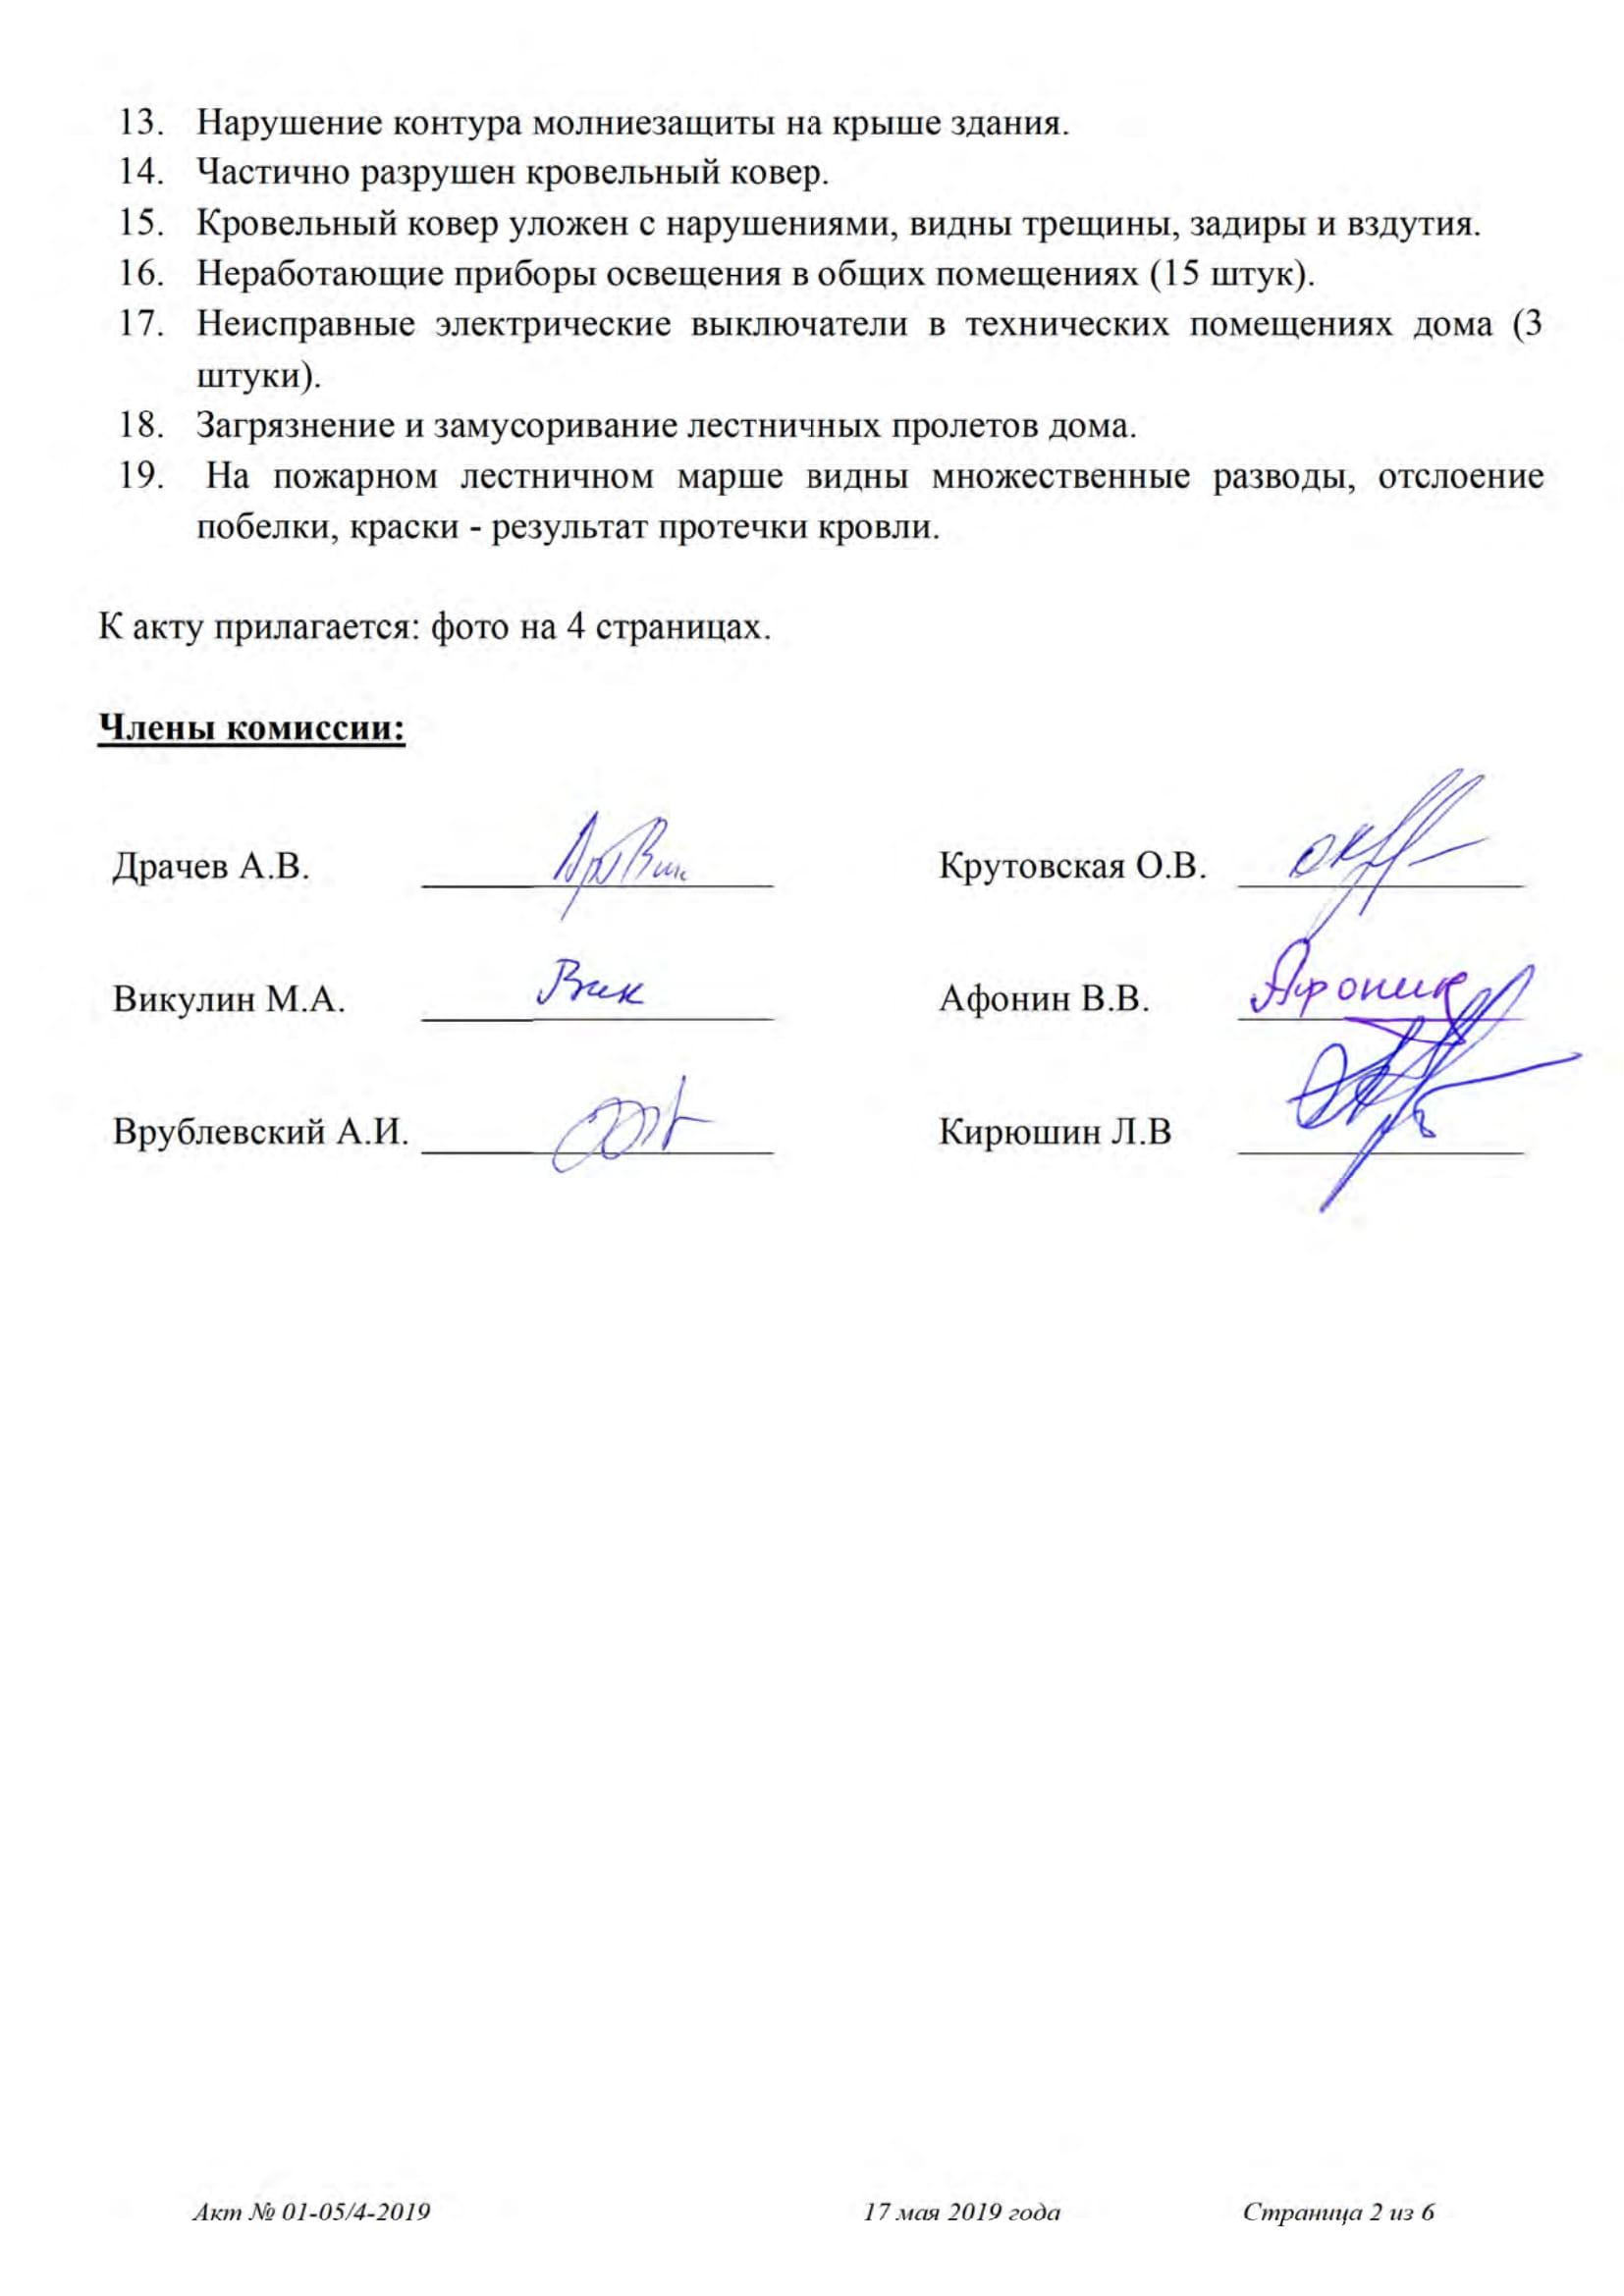 ЖКХ-Контроль-АКТ-Фрегат4-1_sign_imgS-2